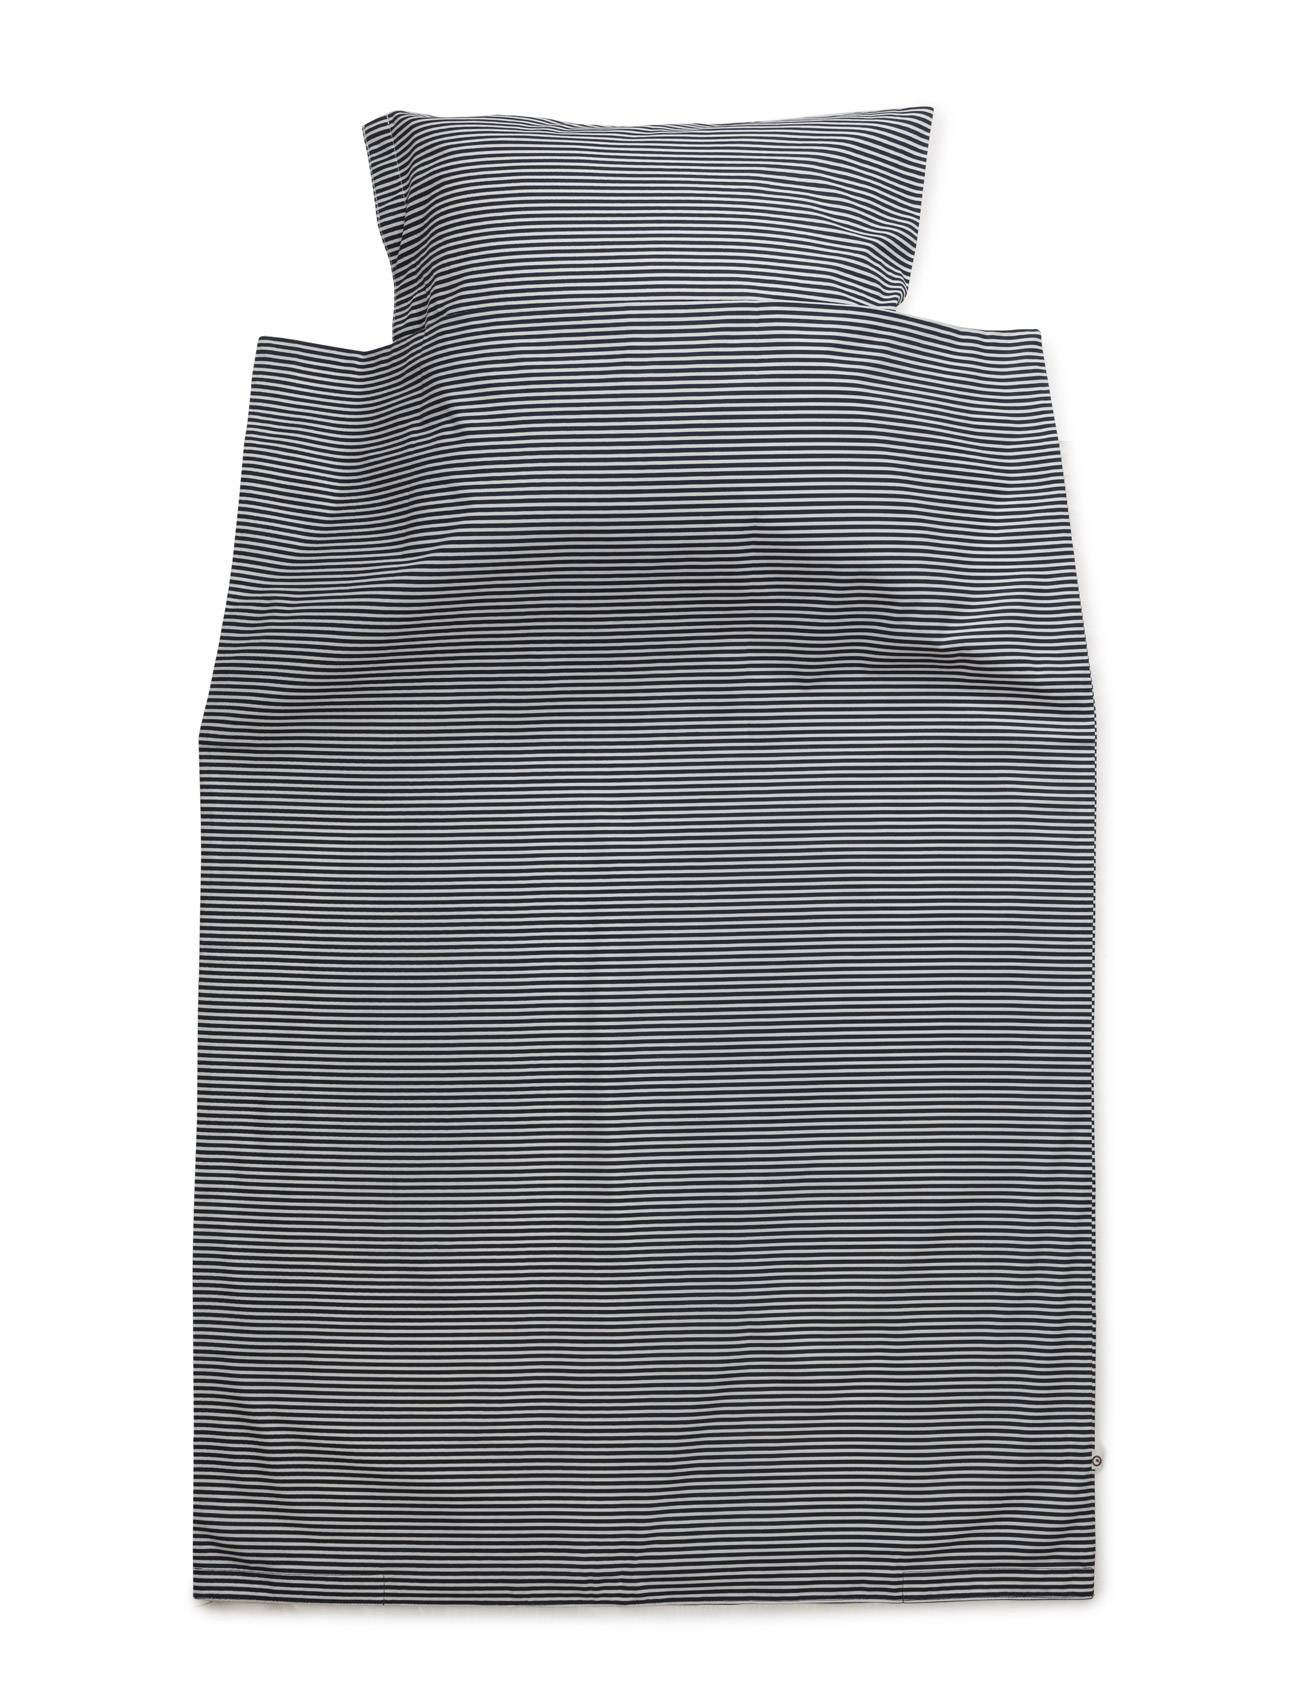 Müsli by Green Cotton Stripe Bed Linen Junior